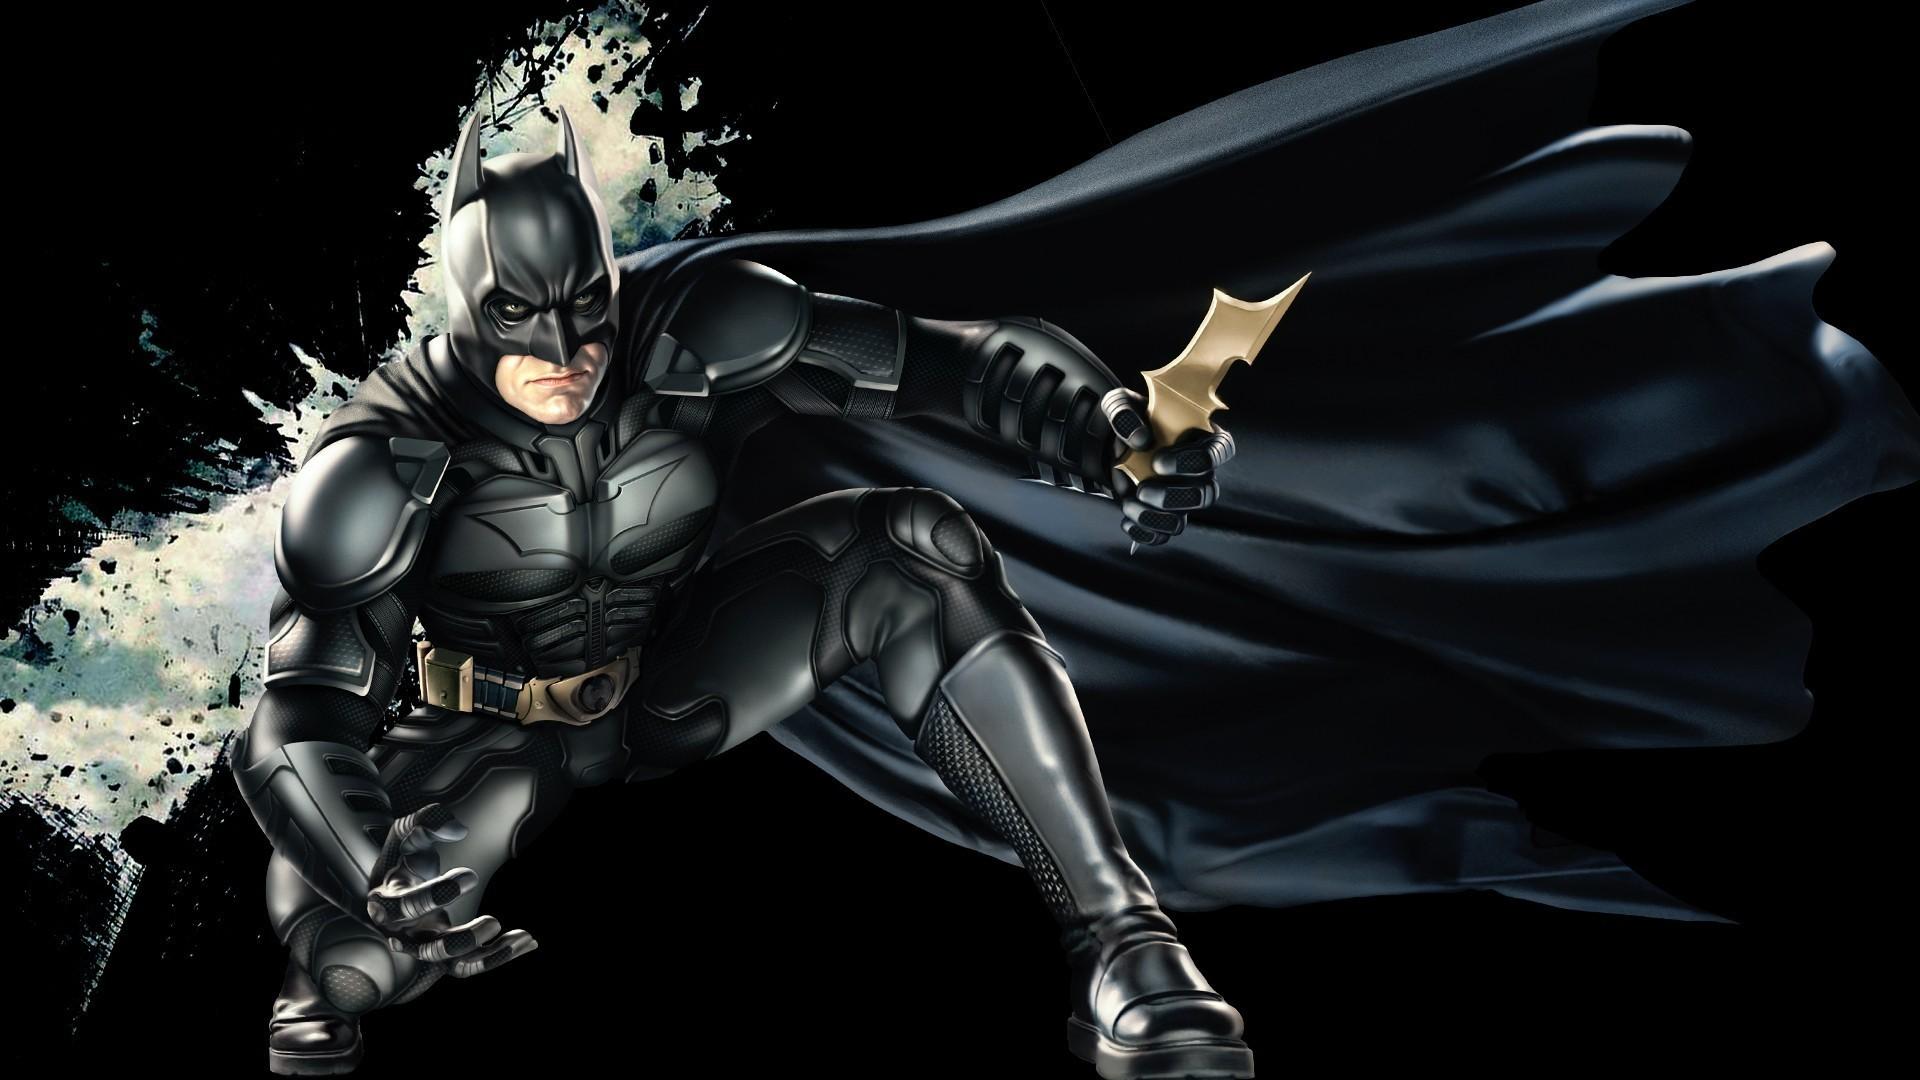 Dark Knight Rises Batman Batman Wallpaper Dark Knight Rises